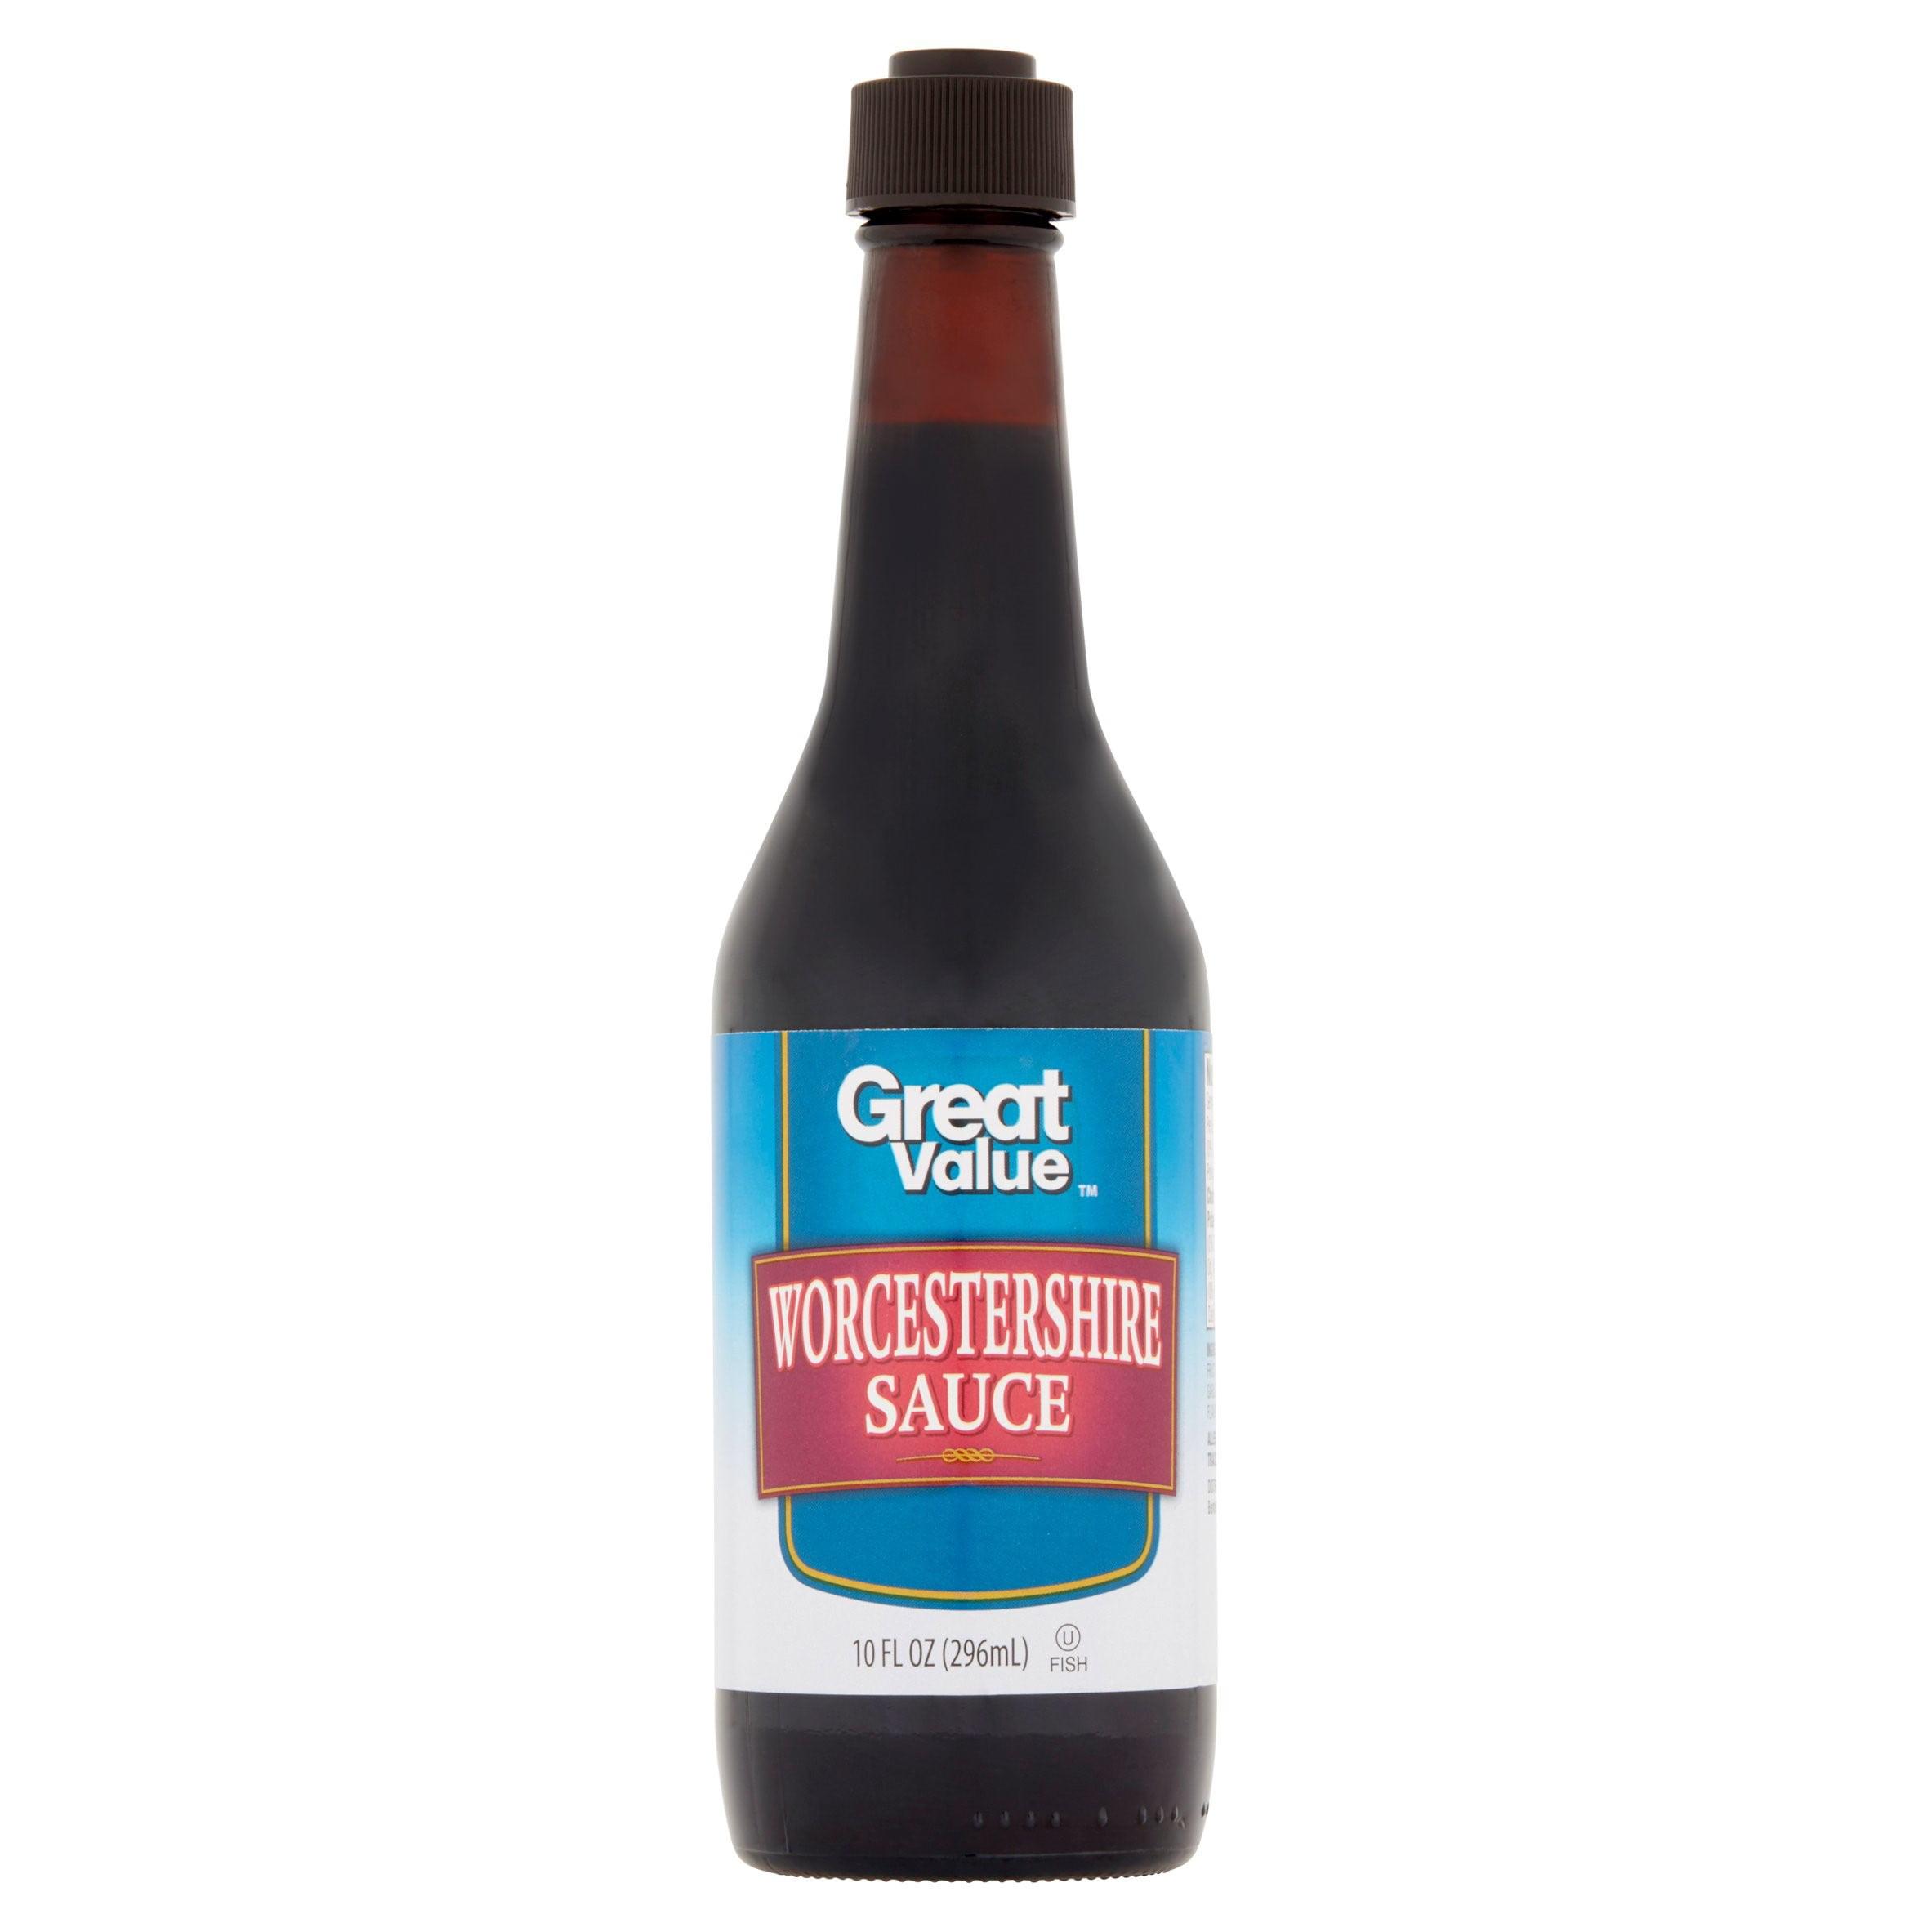 Great Value Worcestershire Sauce, 10 oz - Walmart.com